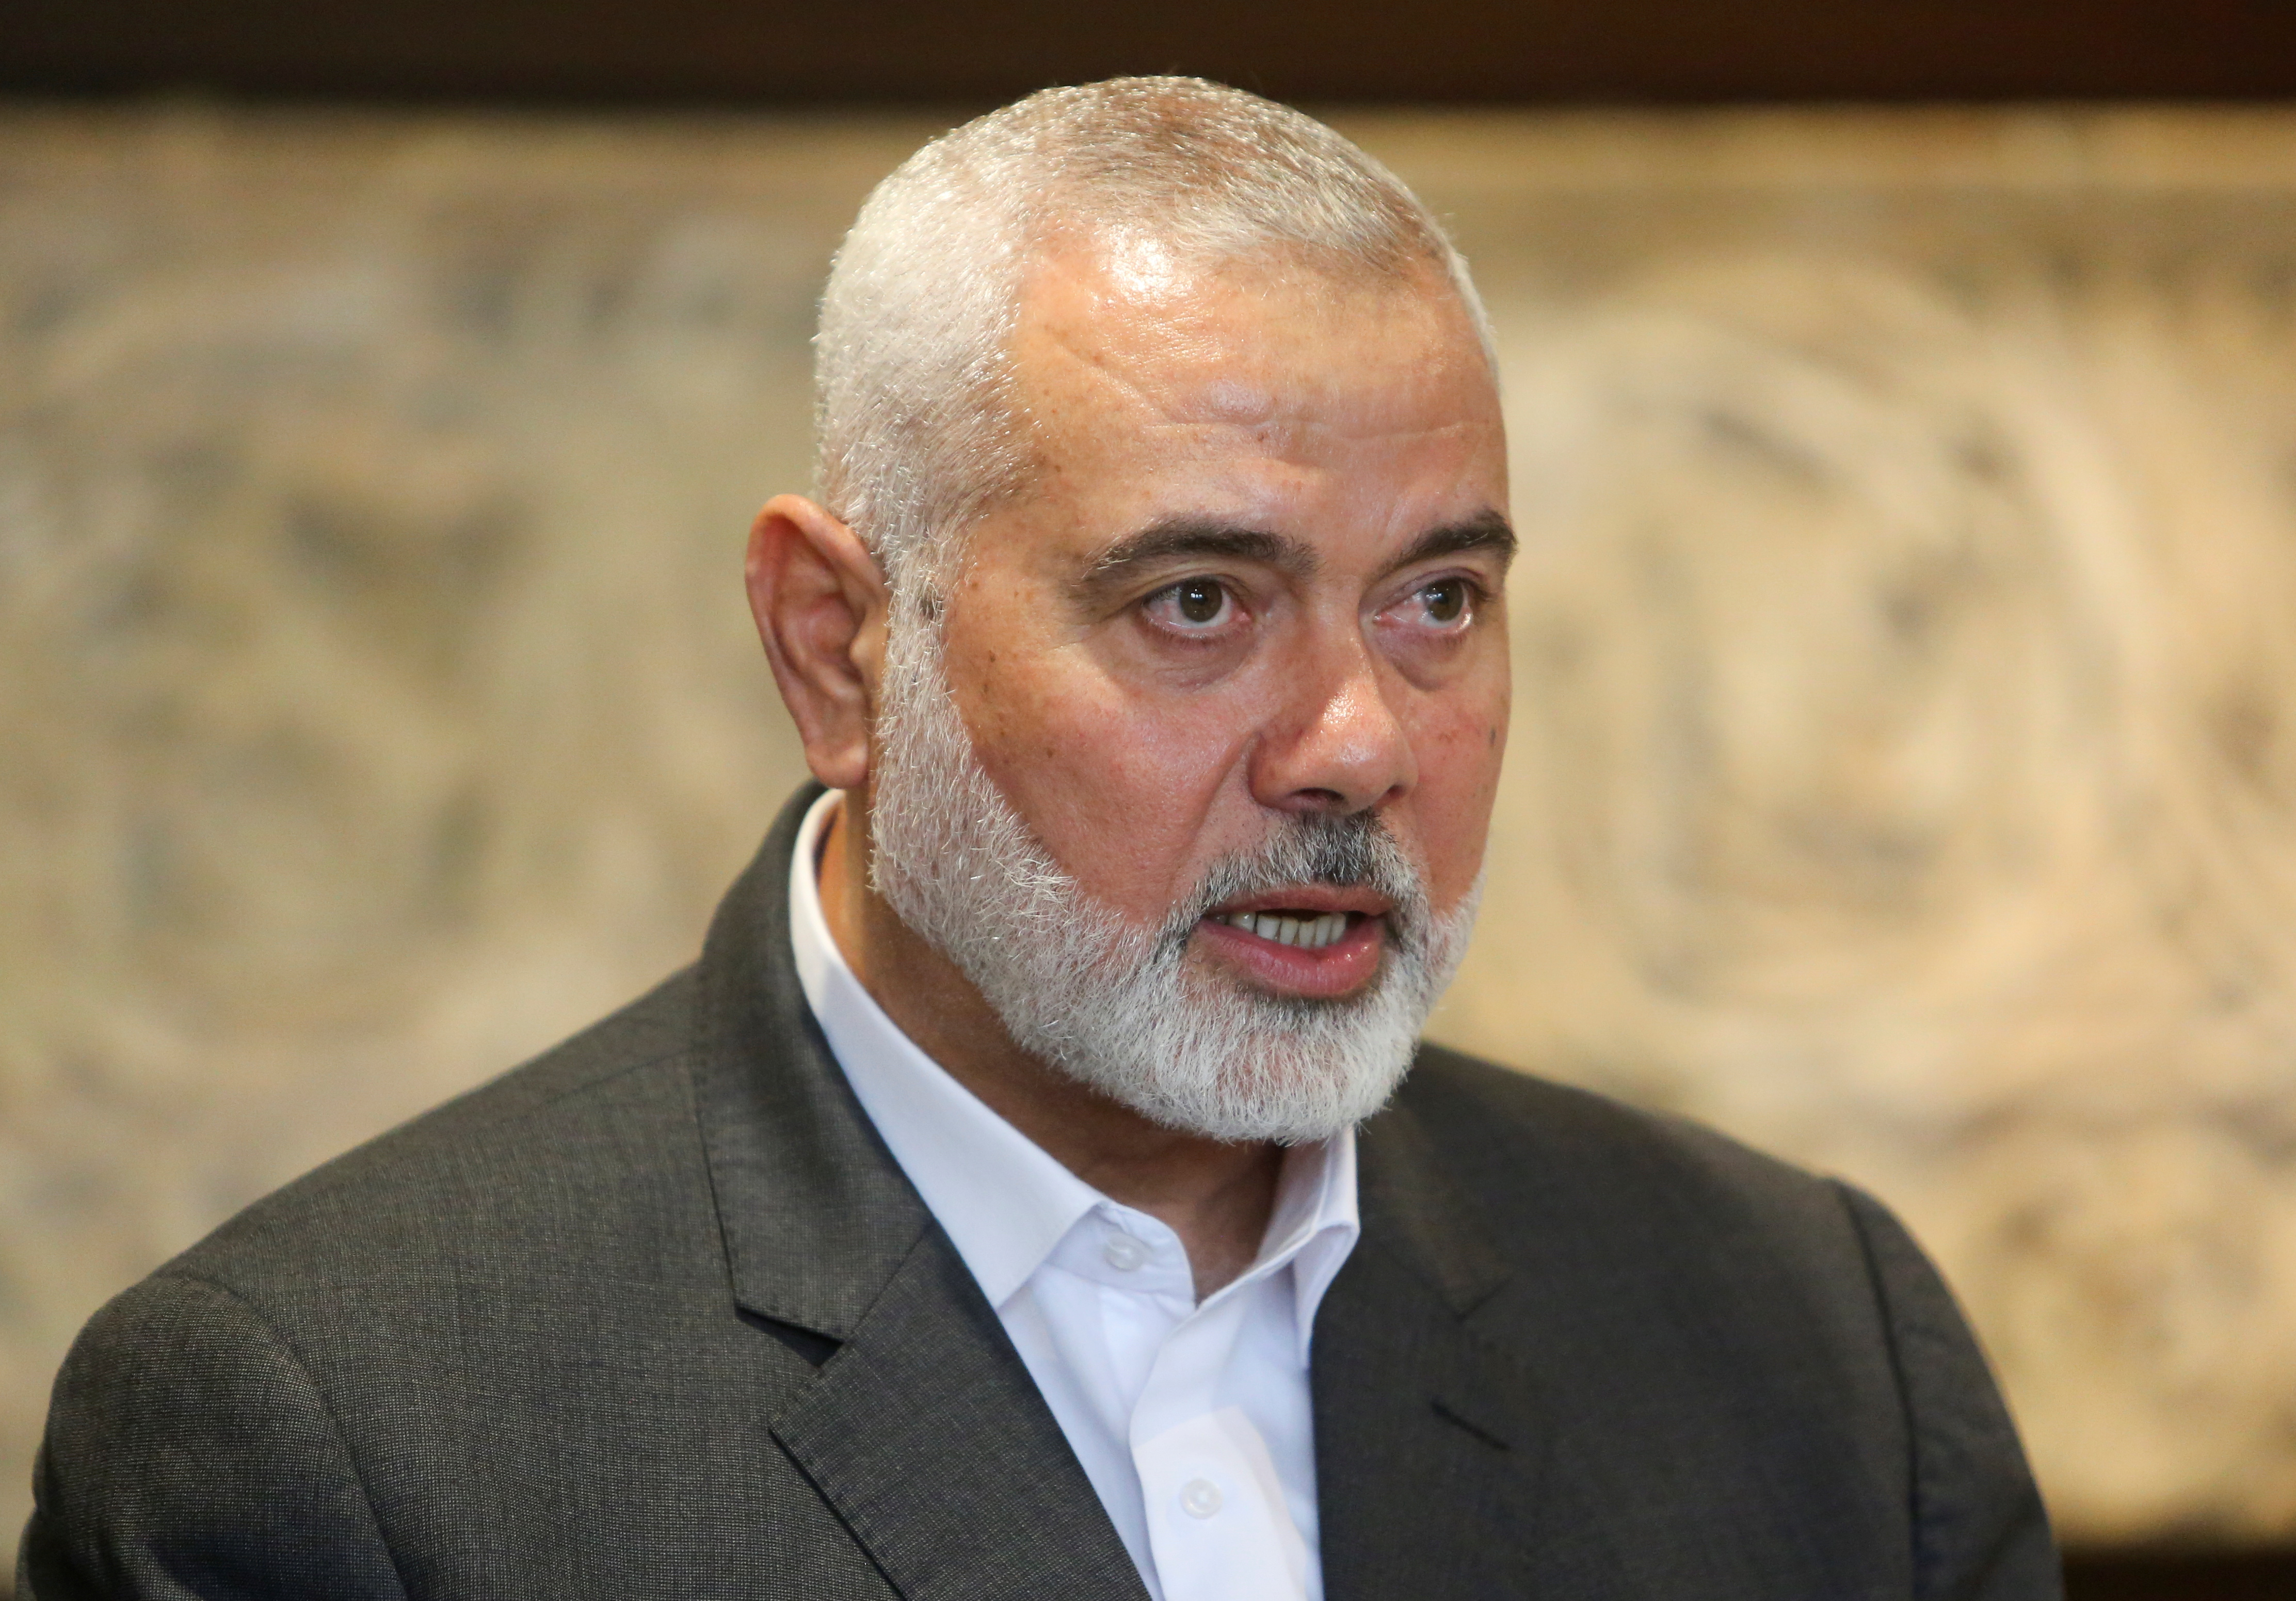 Palestinian group Hamas' top leader, Ismail Haniyeh talks after meeting with Lebanese Parliament Speaker Nabih Berri in Beirut, Lebanon June 28, 2021. REUTERS/Aziz Taher/Files